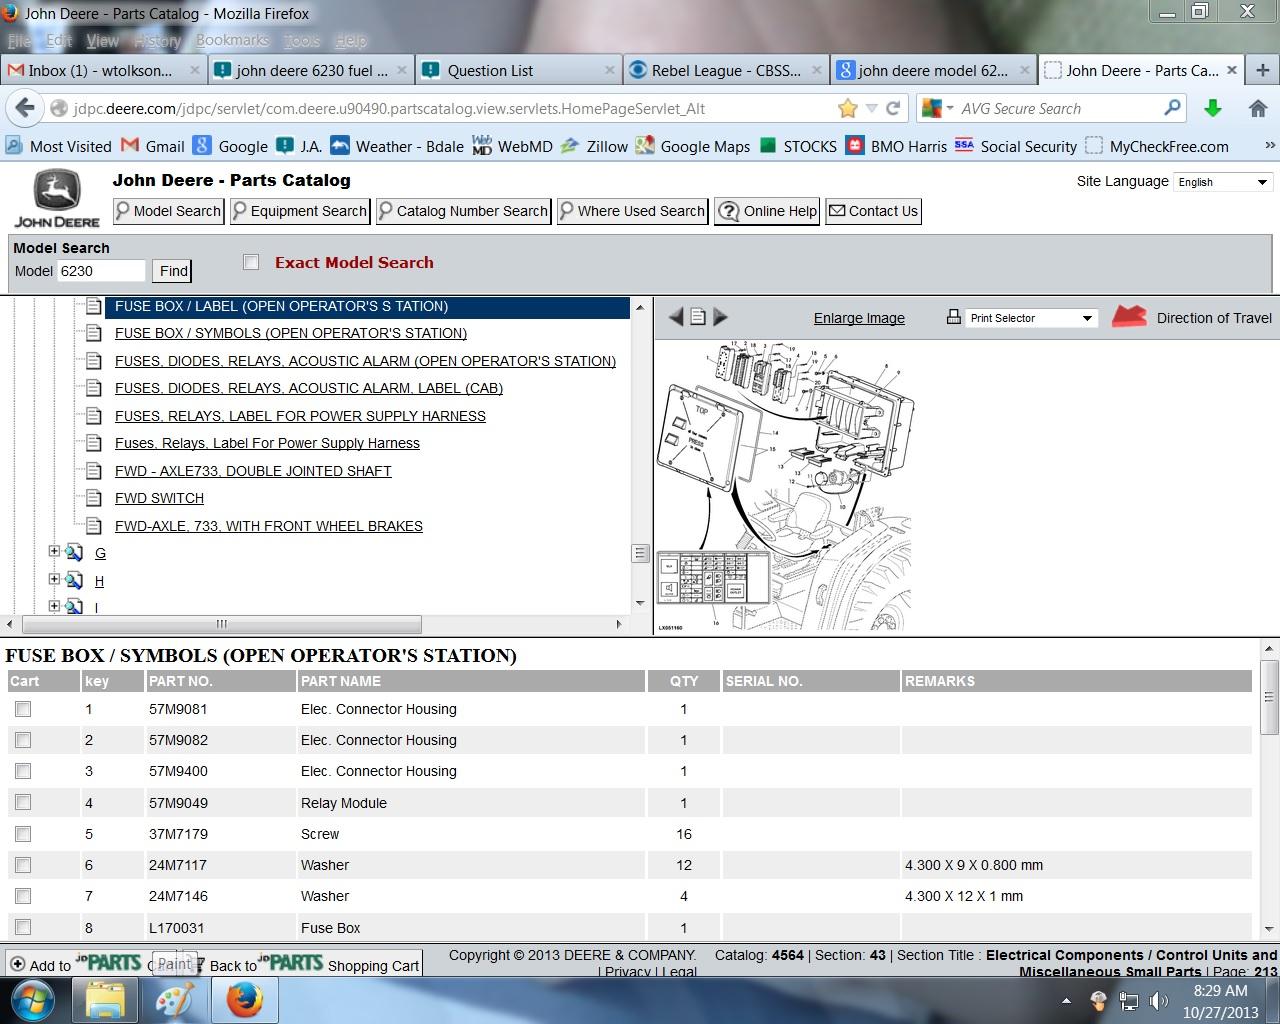 deere 6230 fuel transfer pump fuse location rh justanswer com john deere 4310 fuse box diagram john deere 5525 fuse box location